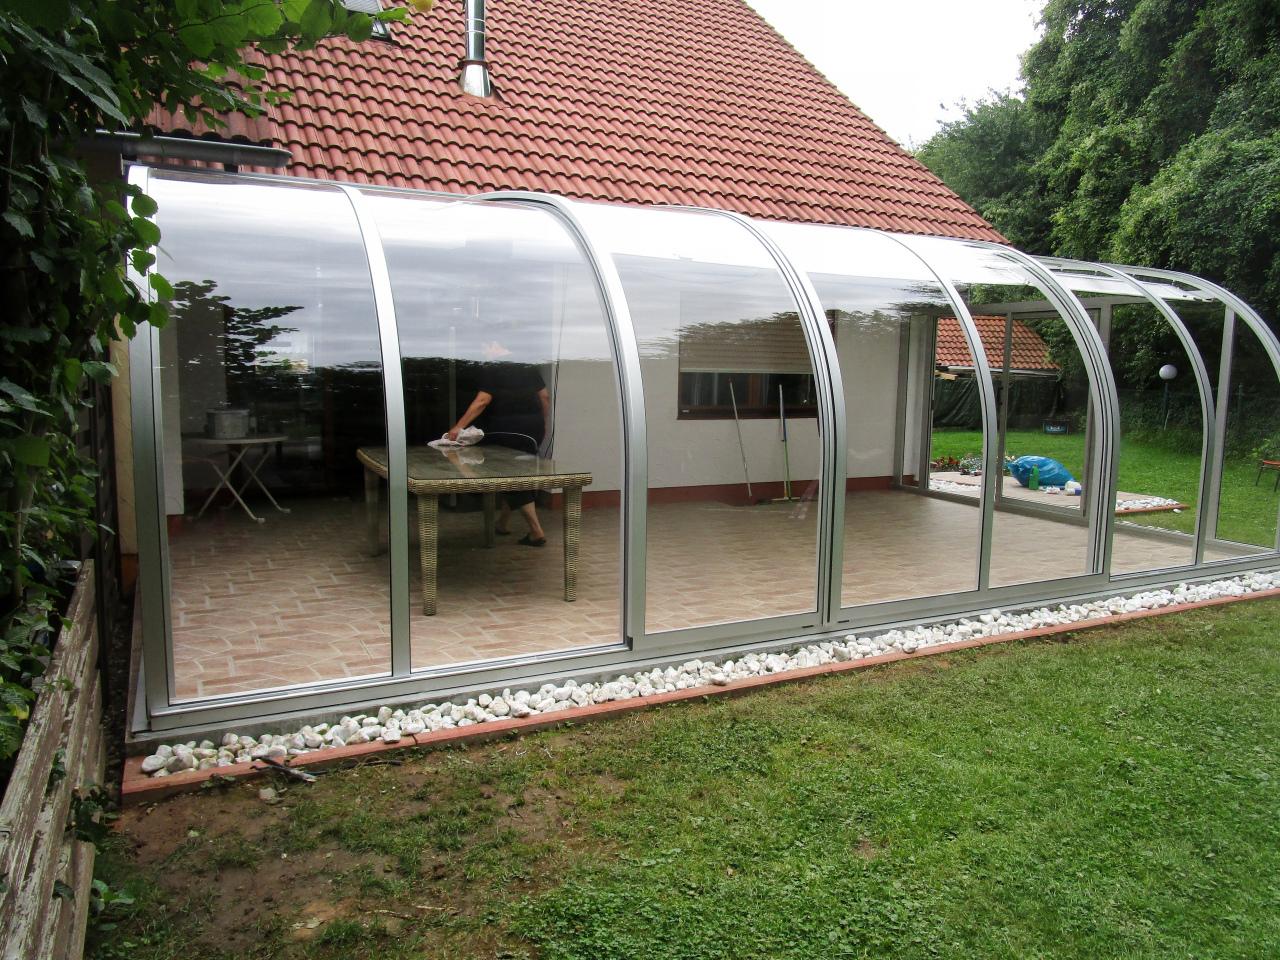 porch shades terrassenuberdachung in holz neu pool terrasse 0d archives greendmv durch porch shades